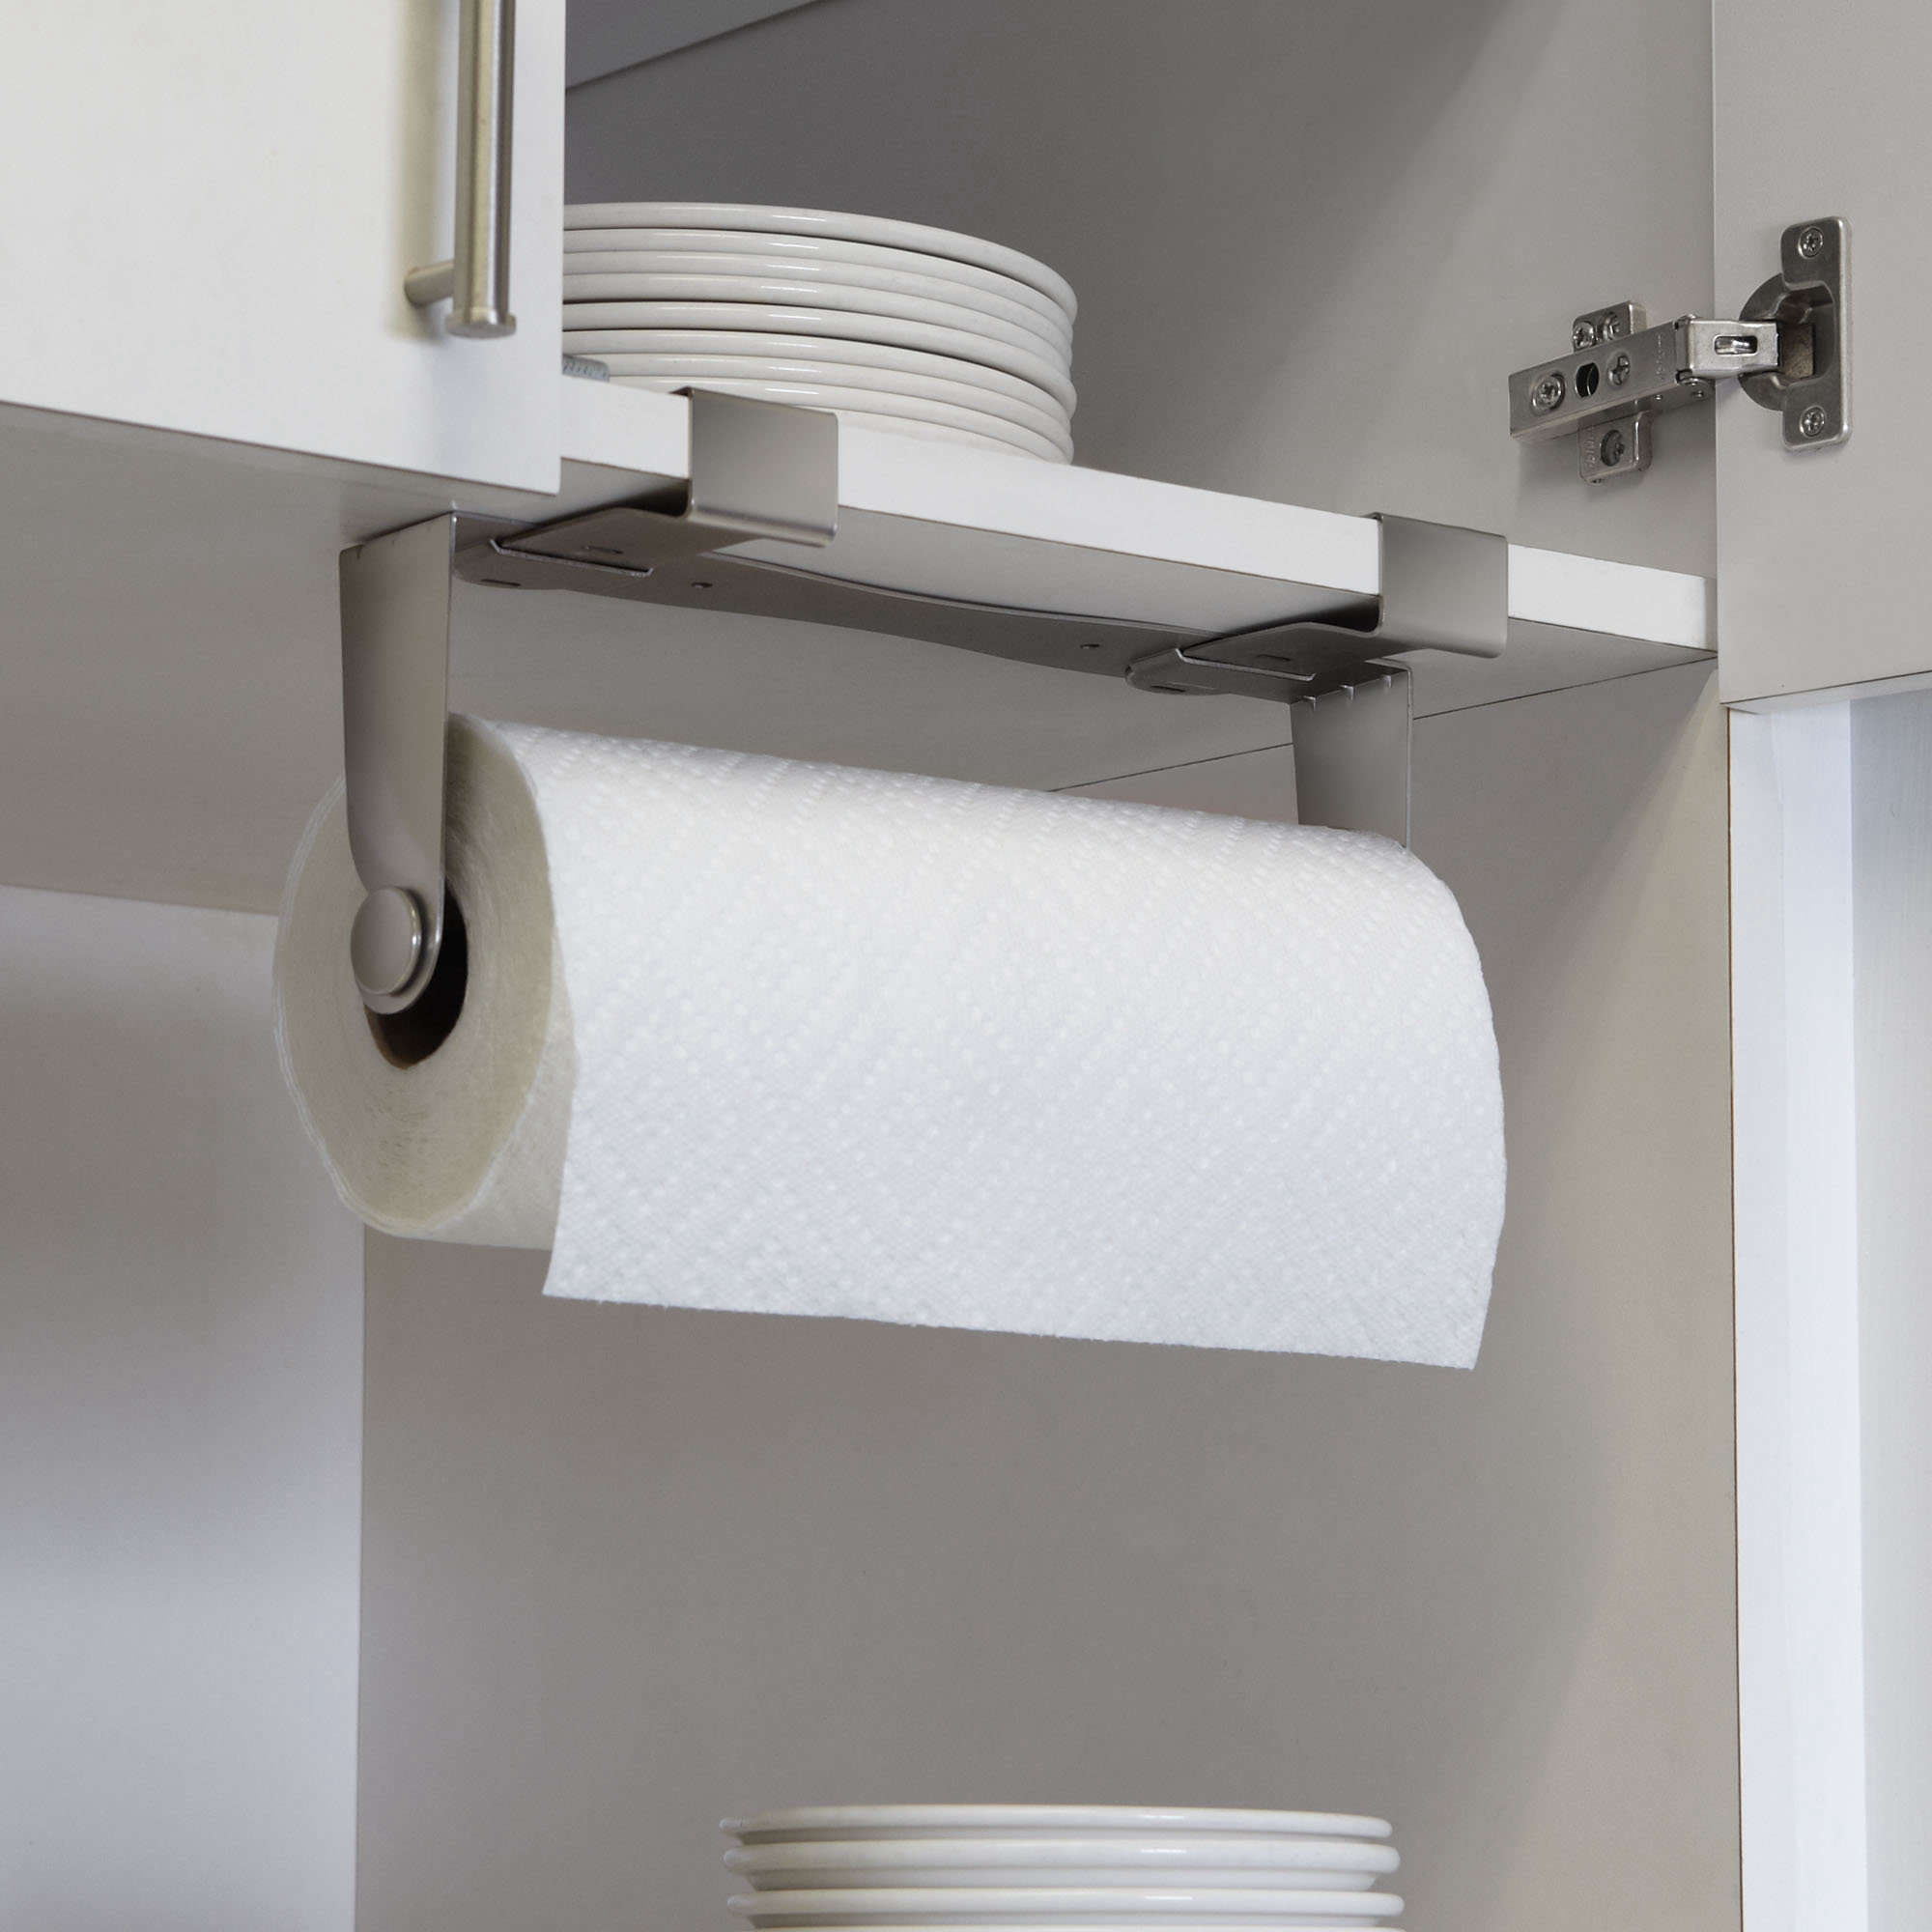 kitchen paper towel holder cabinet knob 5 favorites the no drill instant